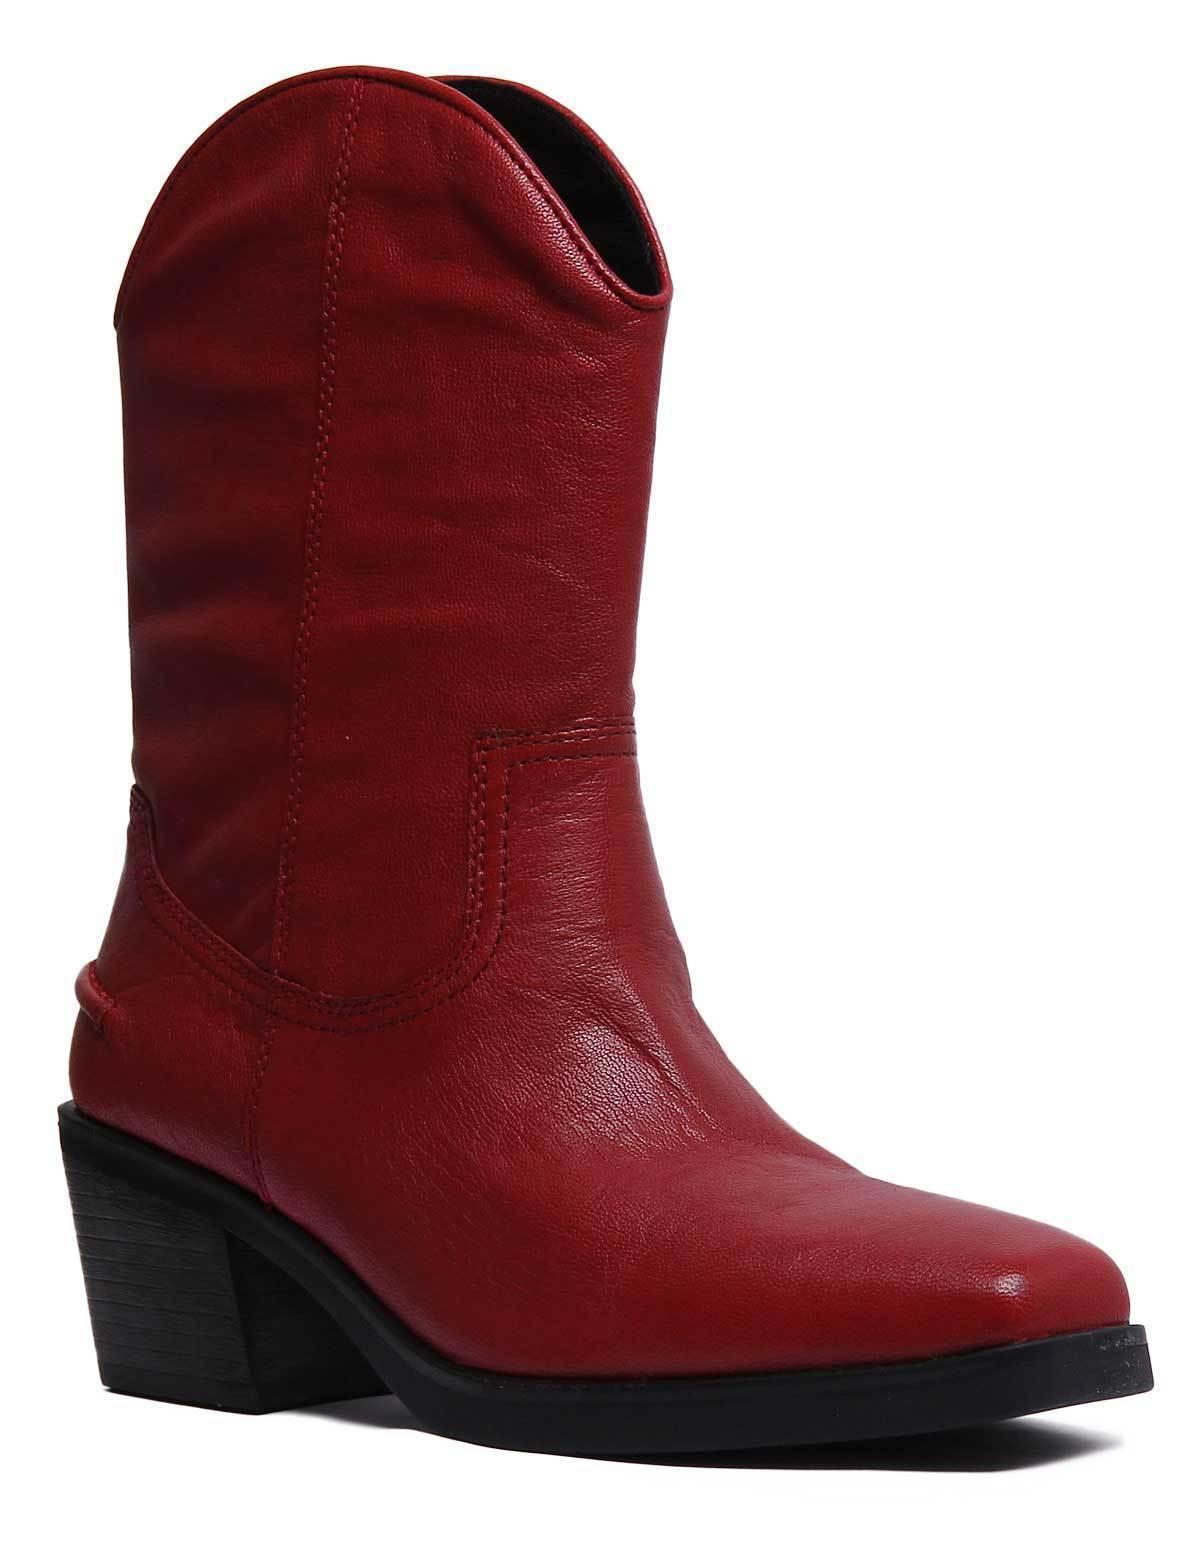 Vagabond Simone Mujer botas occidental de cuero negro tamaño de 8 Reino Unido 3 - 8 de 855cc5